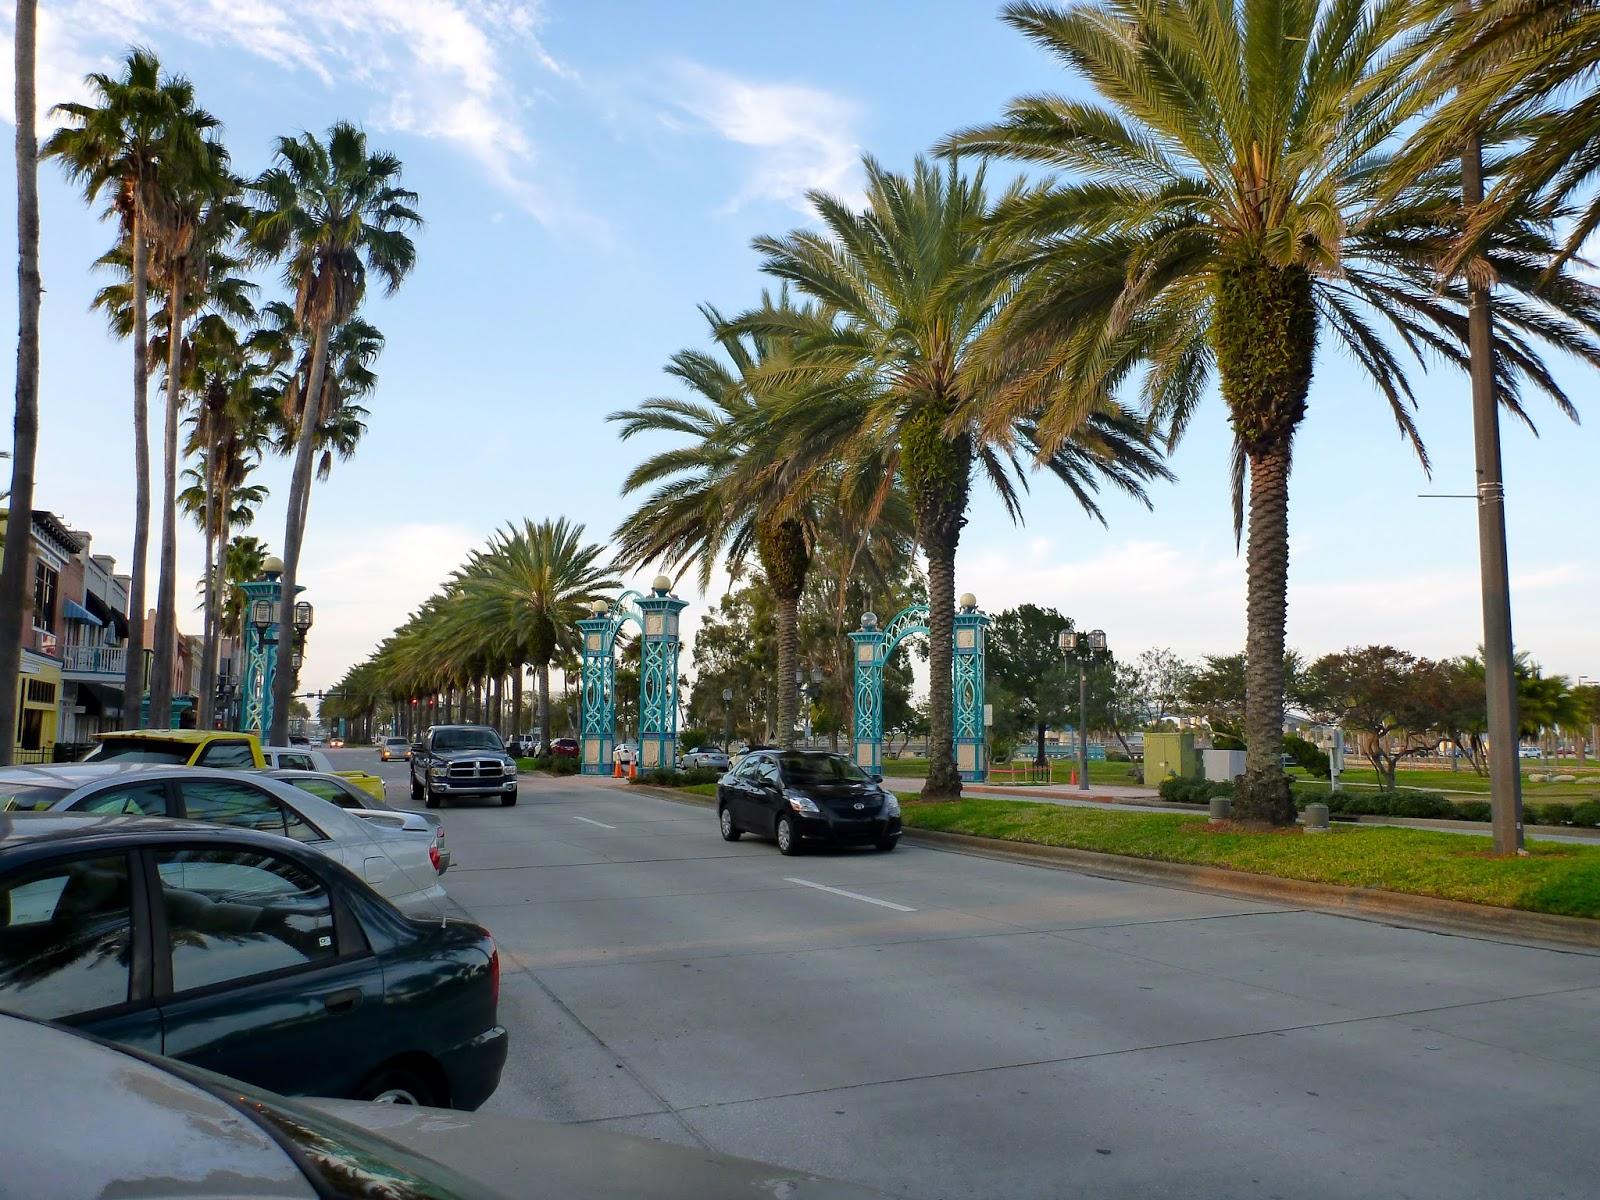 Oasiss Journey St Augustine FL SM 778 To Daytona Beach